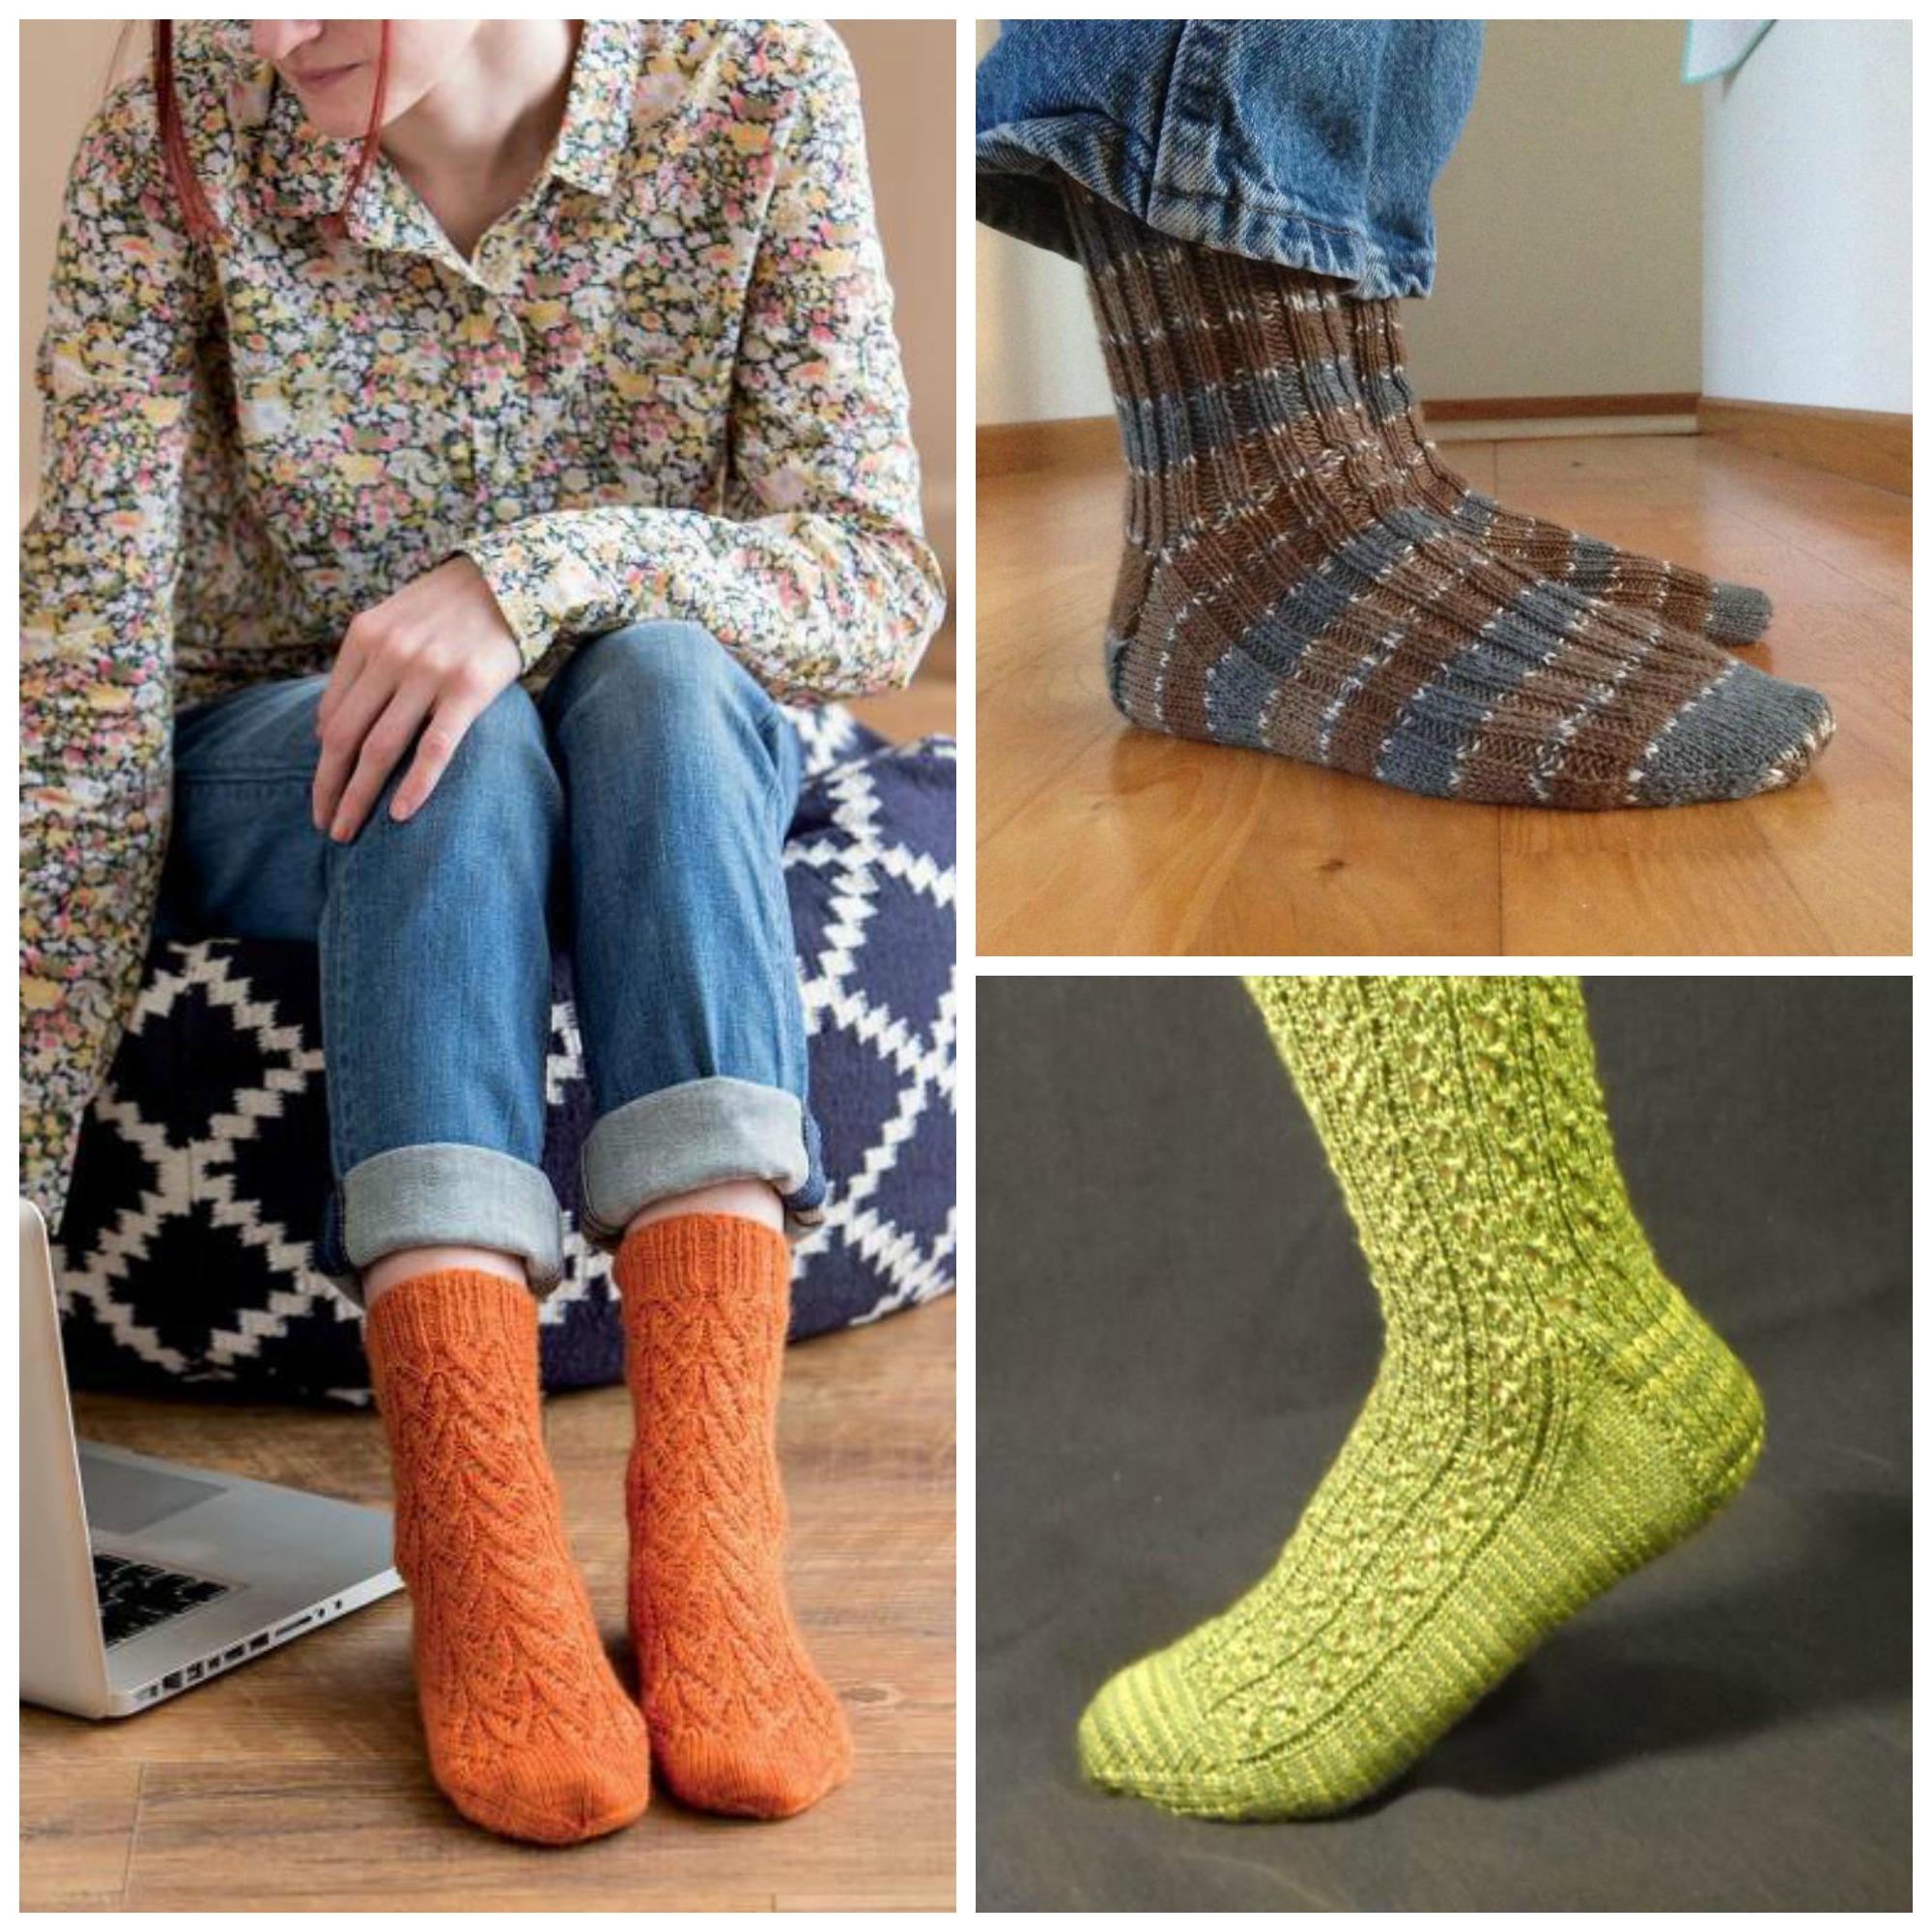 Knit Socks Collage